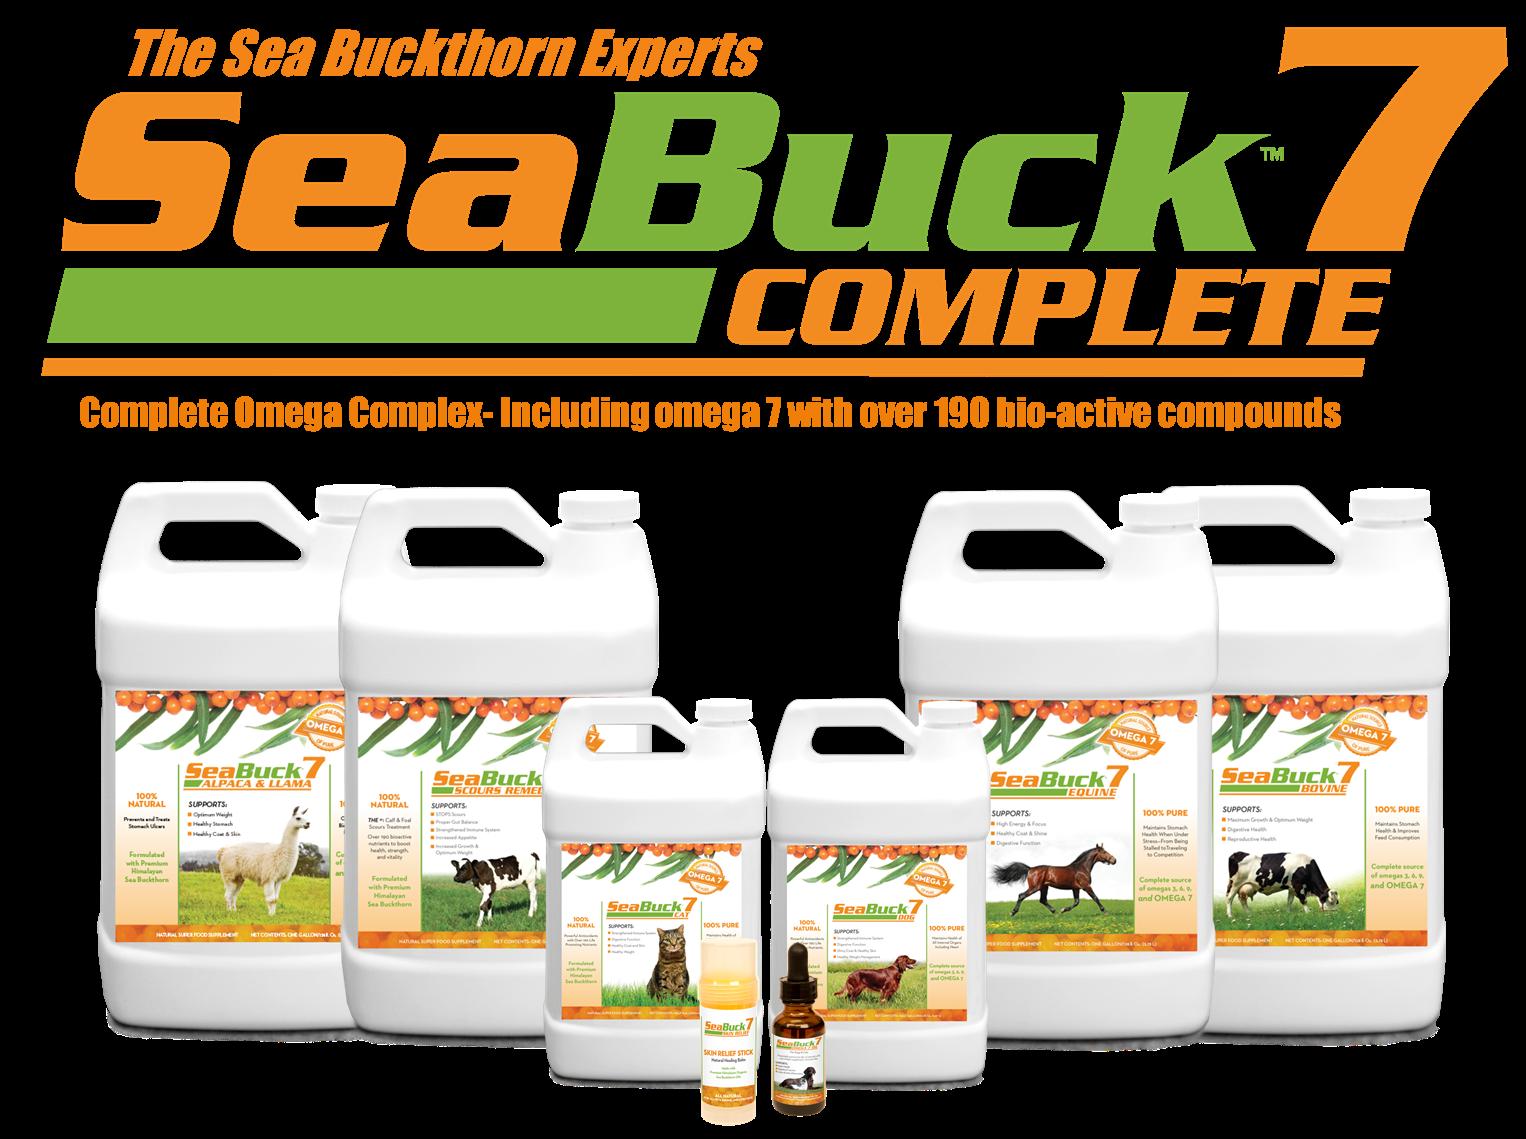 SeaBuck 7